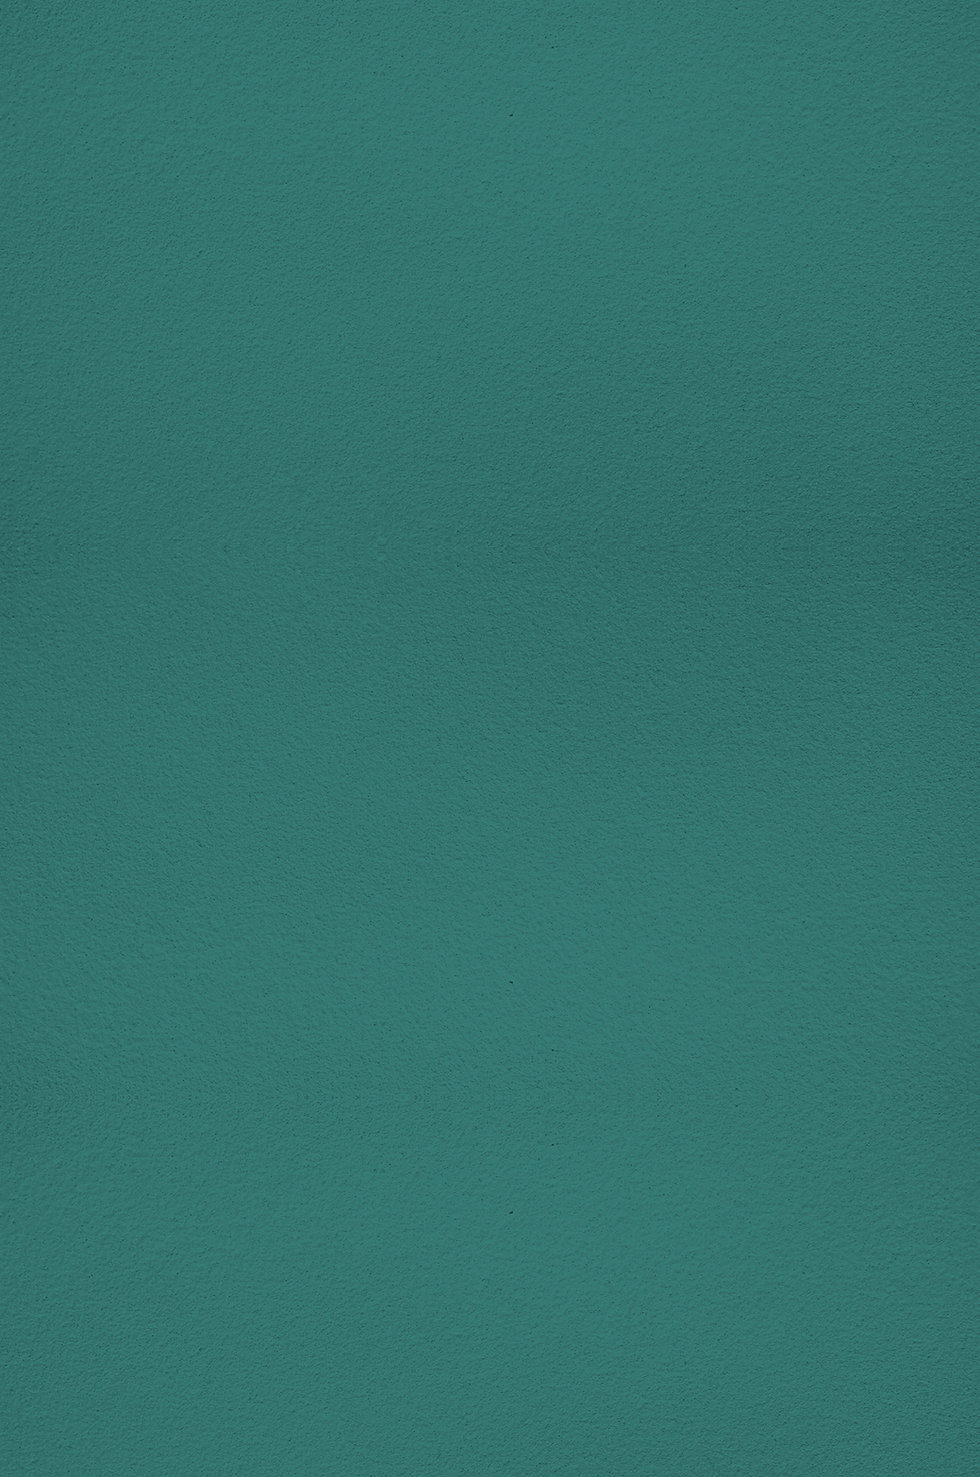 fond vert.jpg